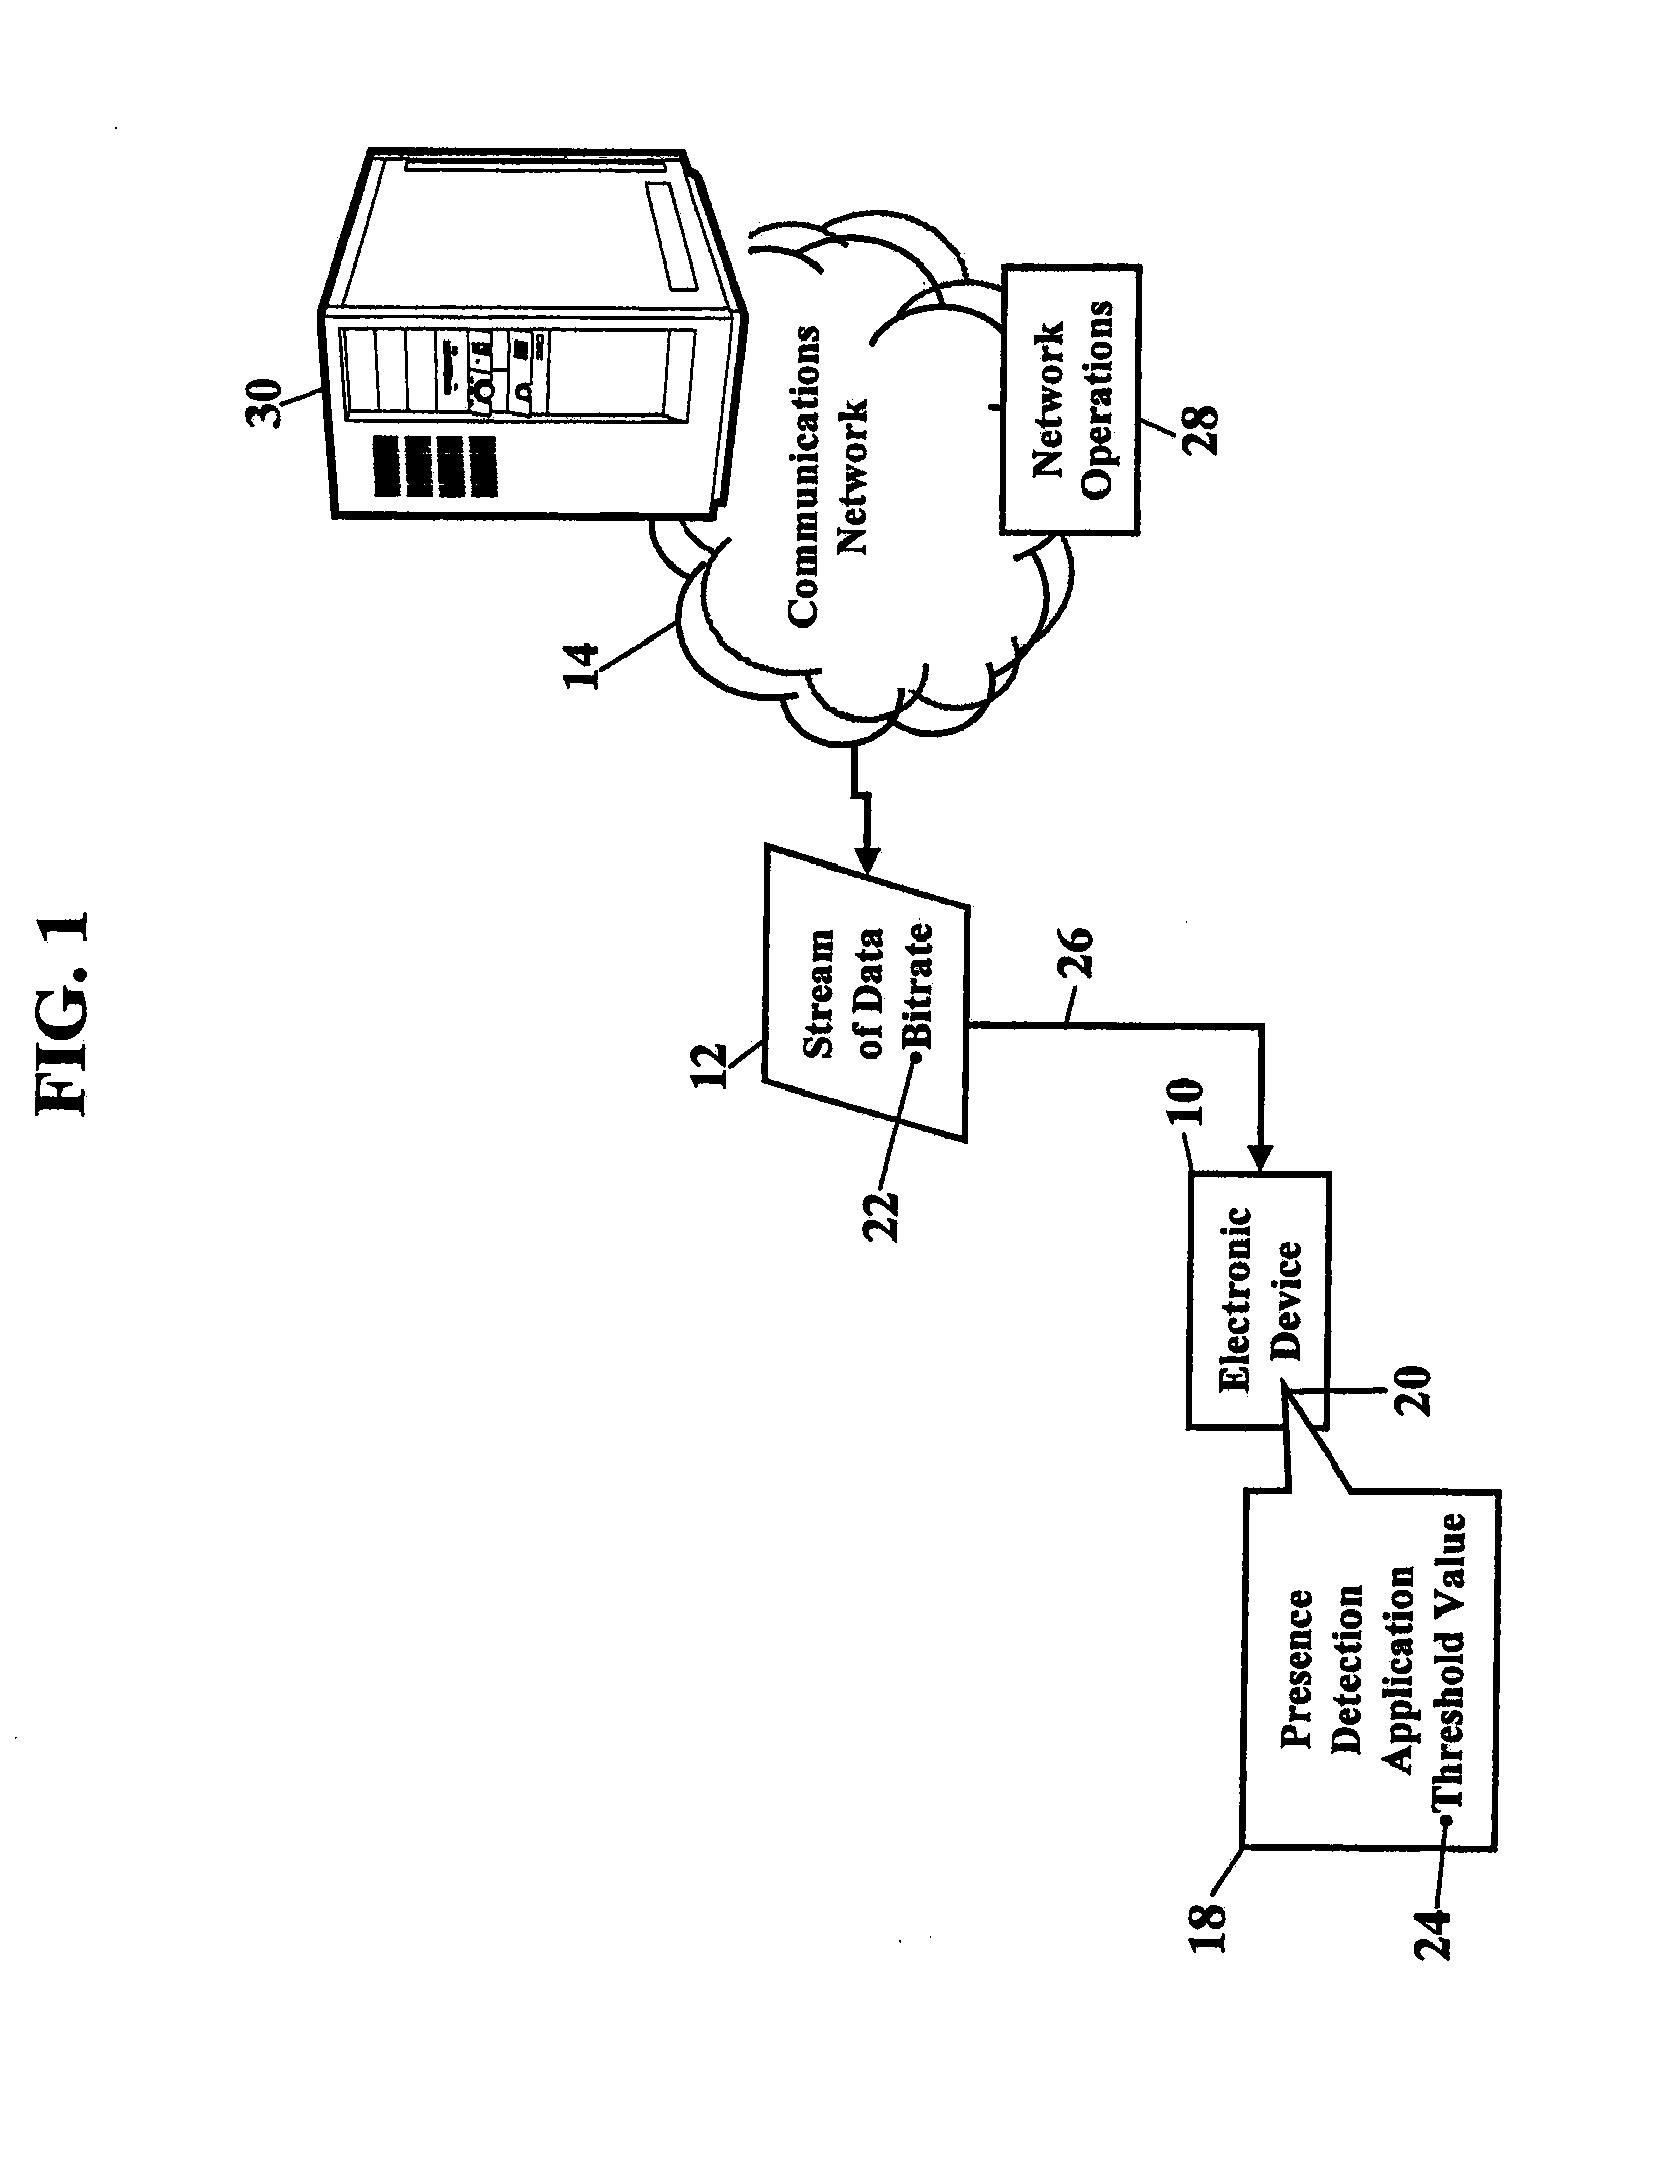 patent us 8 621 500 b2 Sales Representative Resume patent images patent images